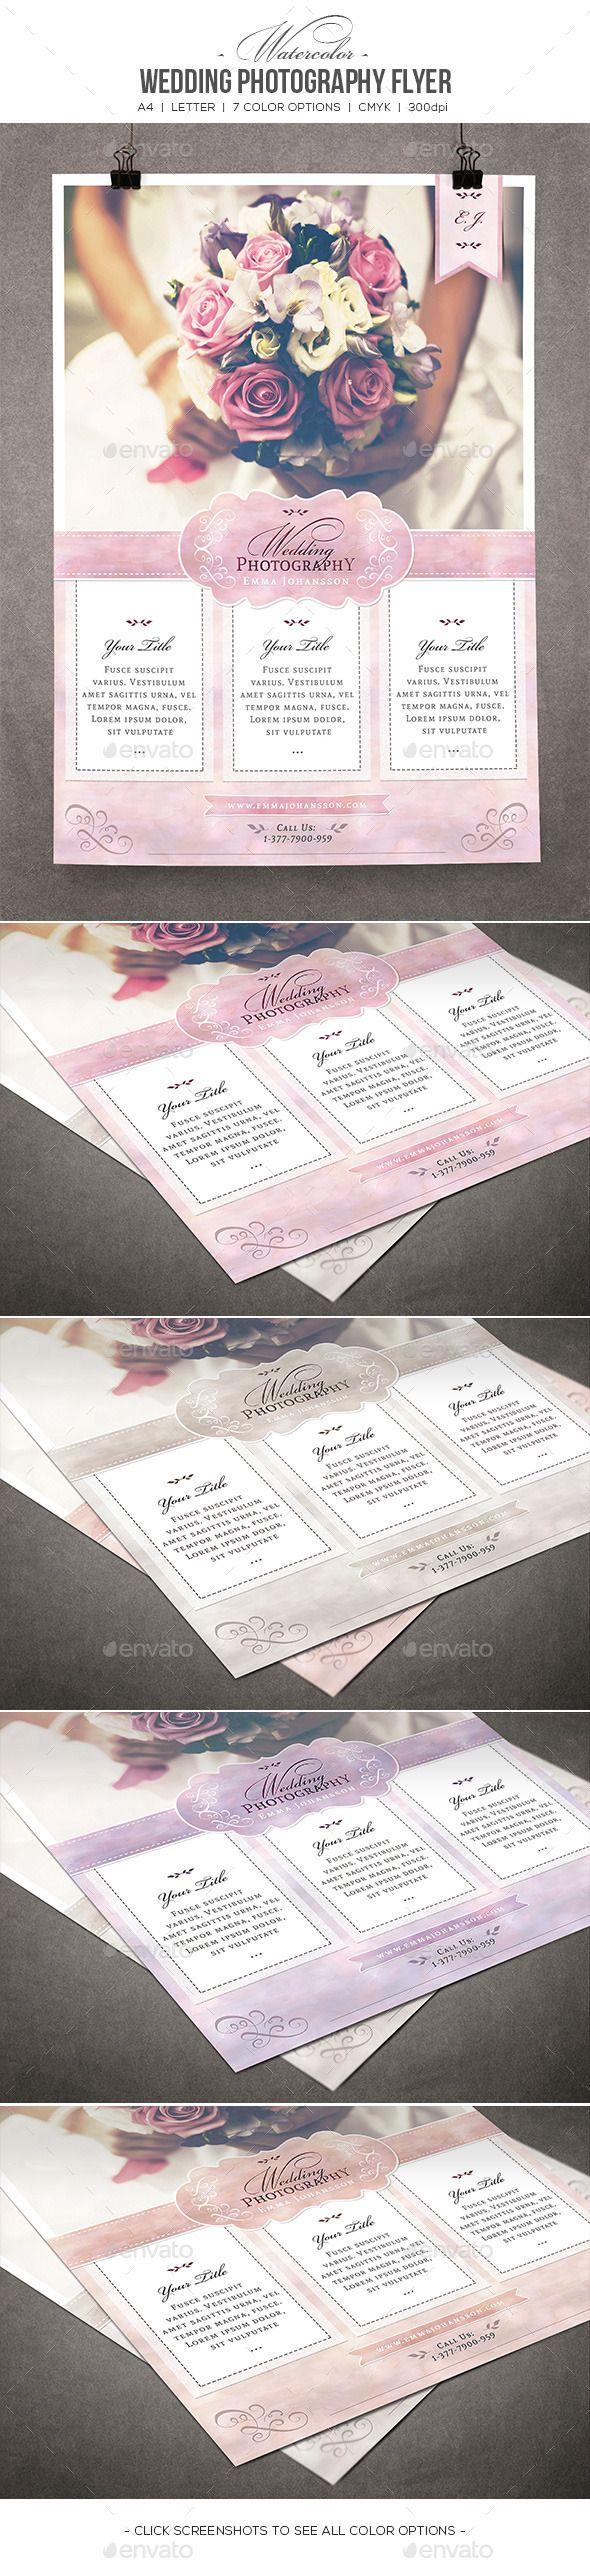 Watercolor Wedding Photography Flyer #psd #photoshop #8.5x11